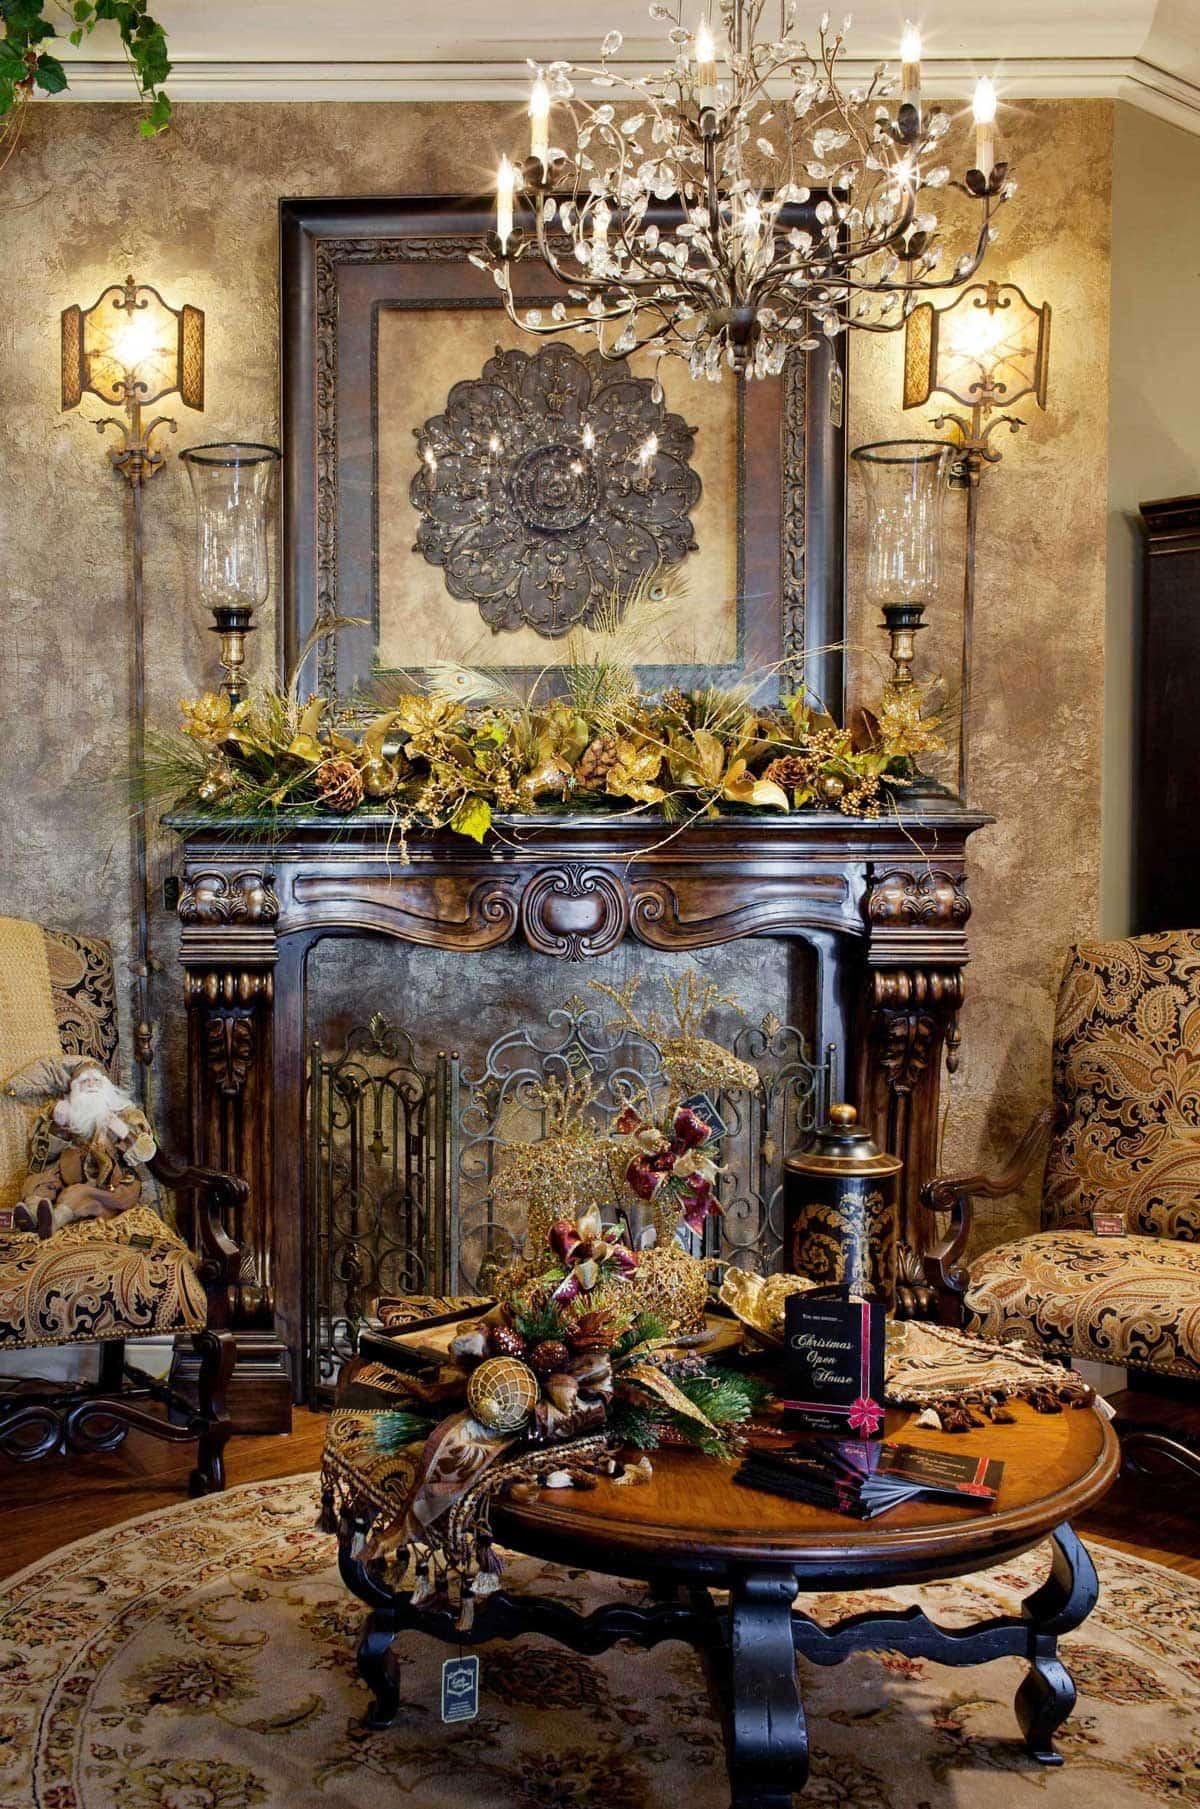 Holiday-Mantel-Luxury-Christmas-Decor